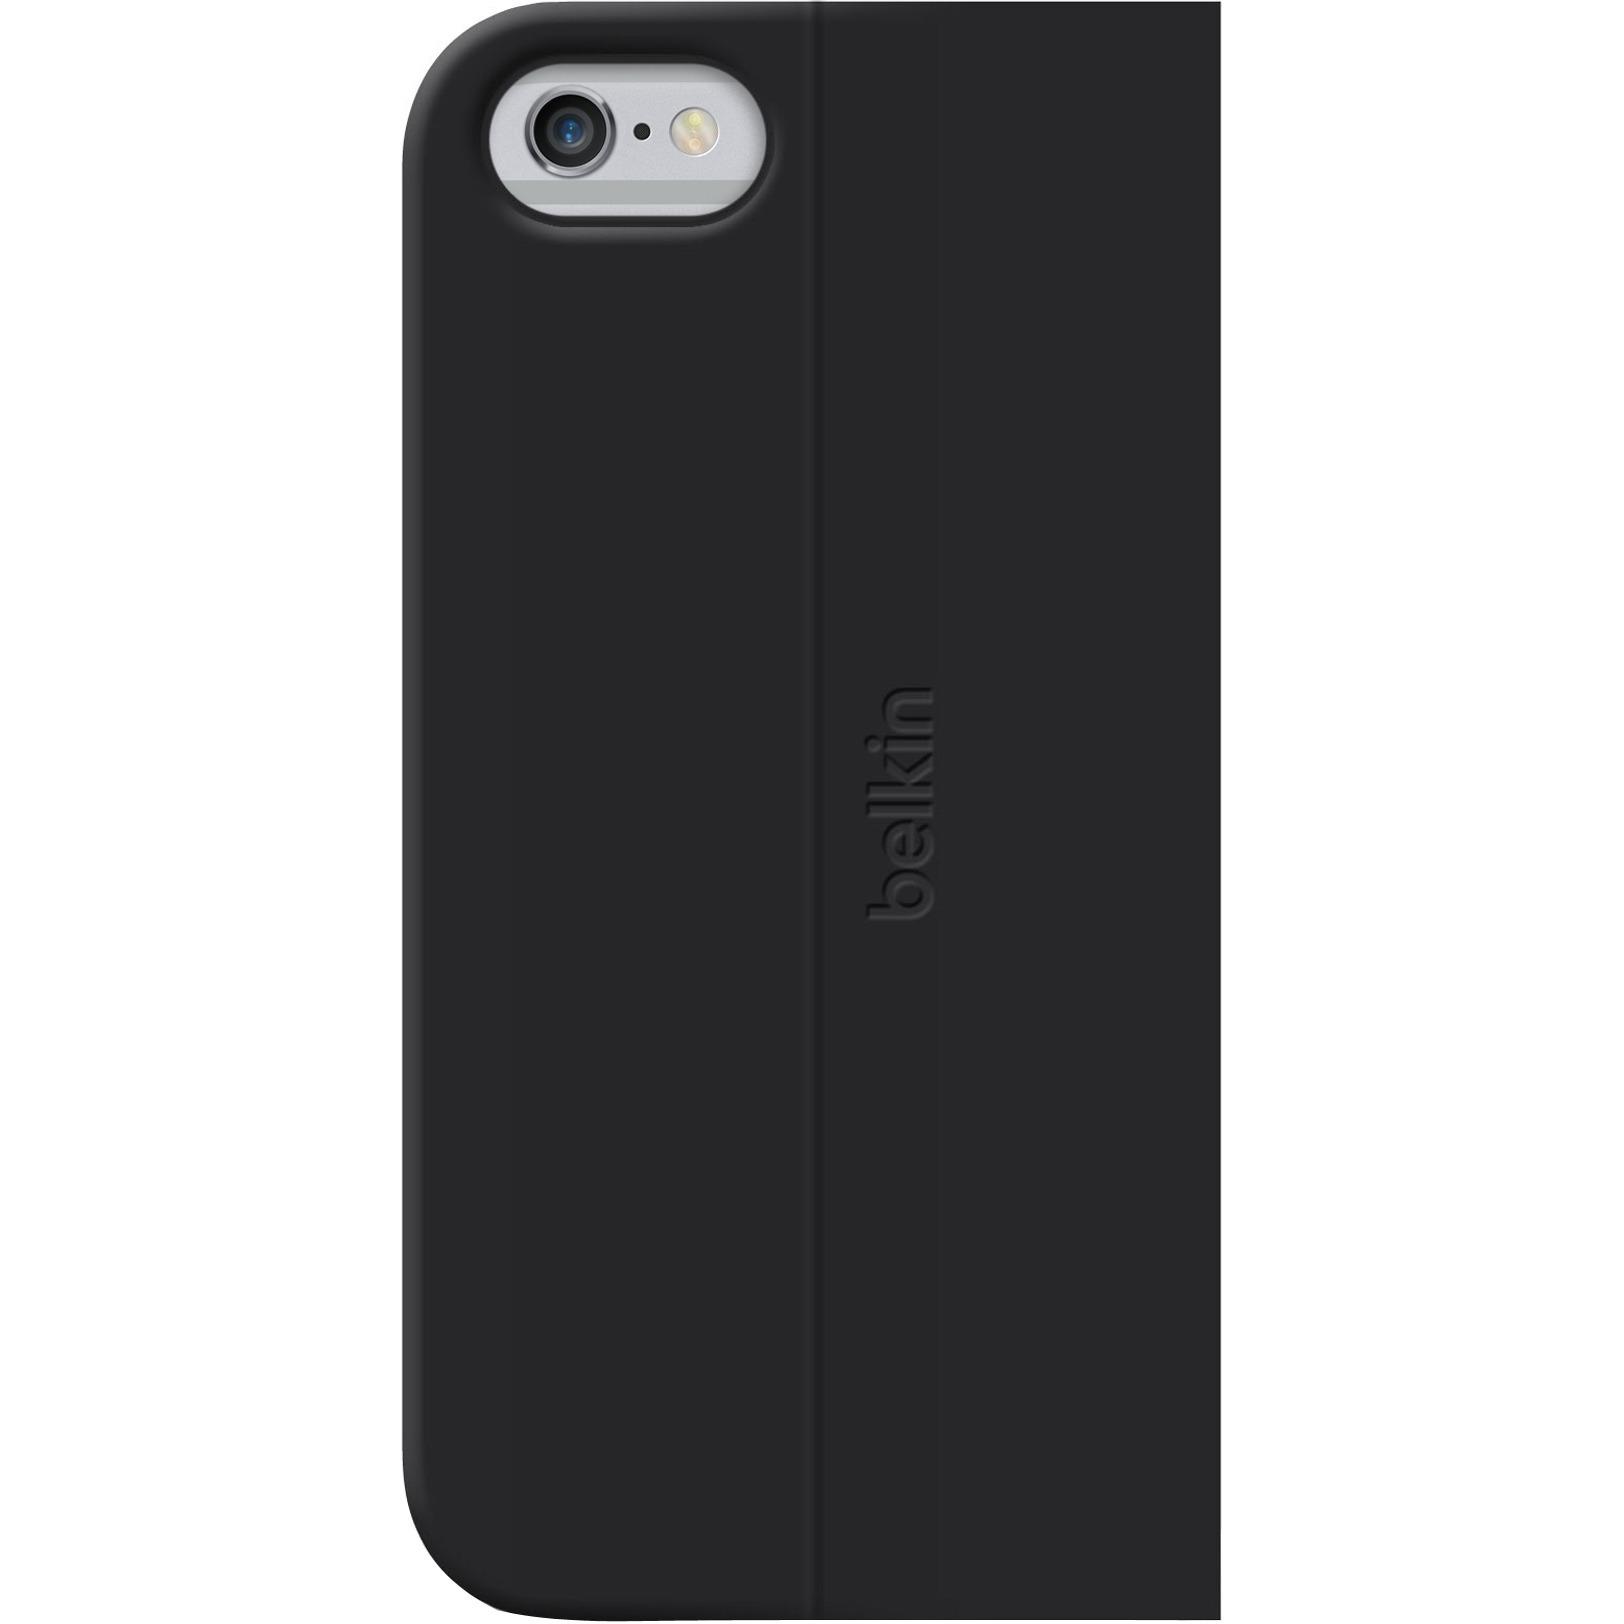 Belkin Classic Folio Carrying Case Folio for iPhone - Blacktop - Scratch Resistant